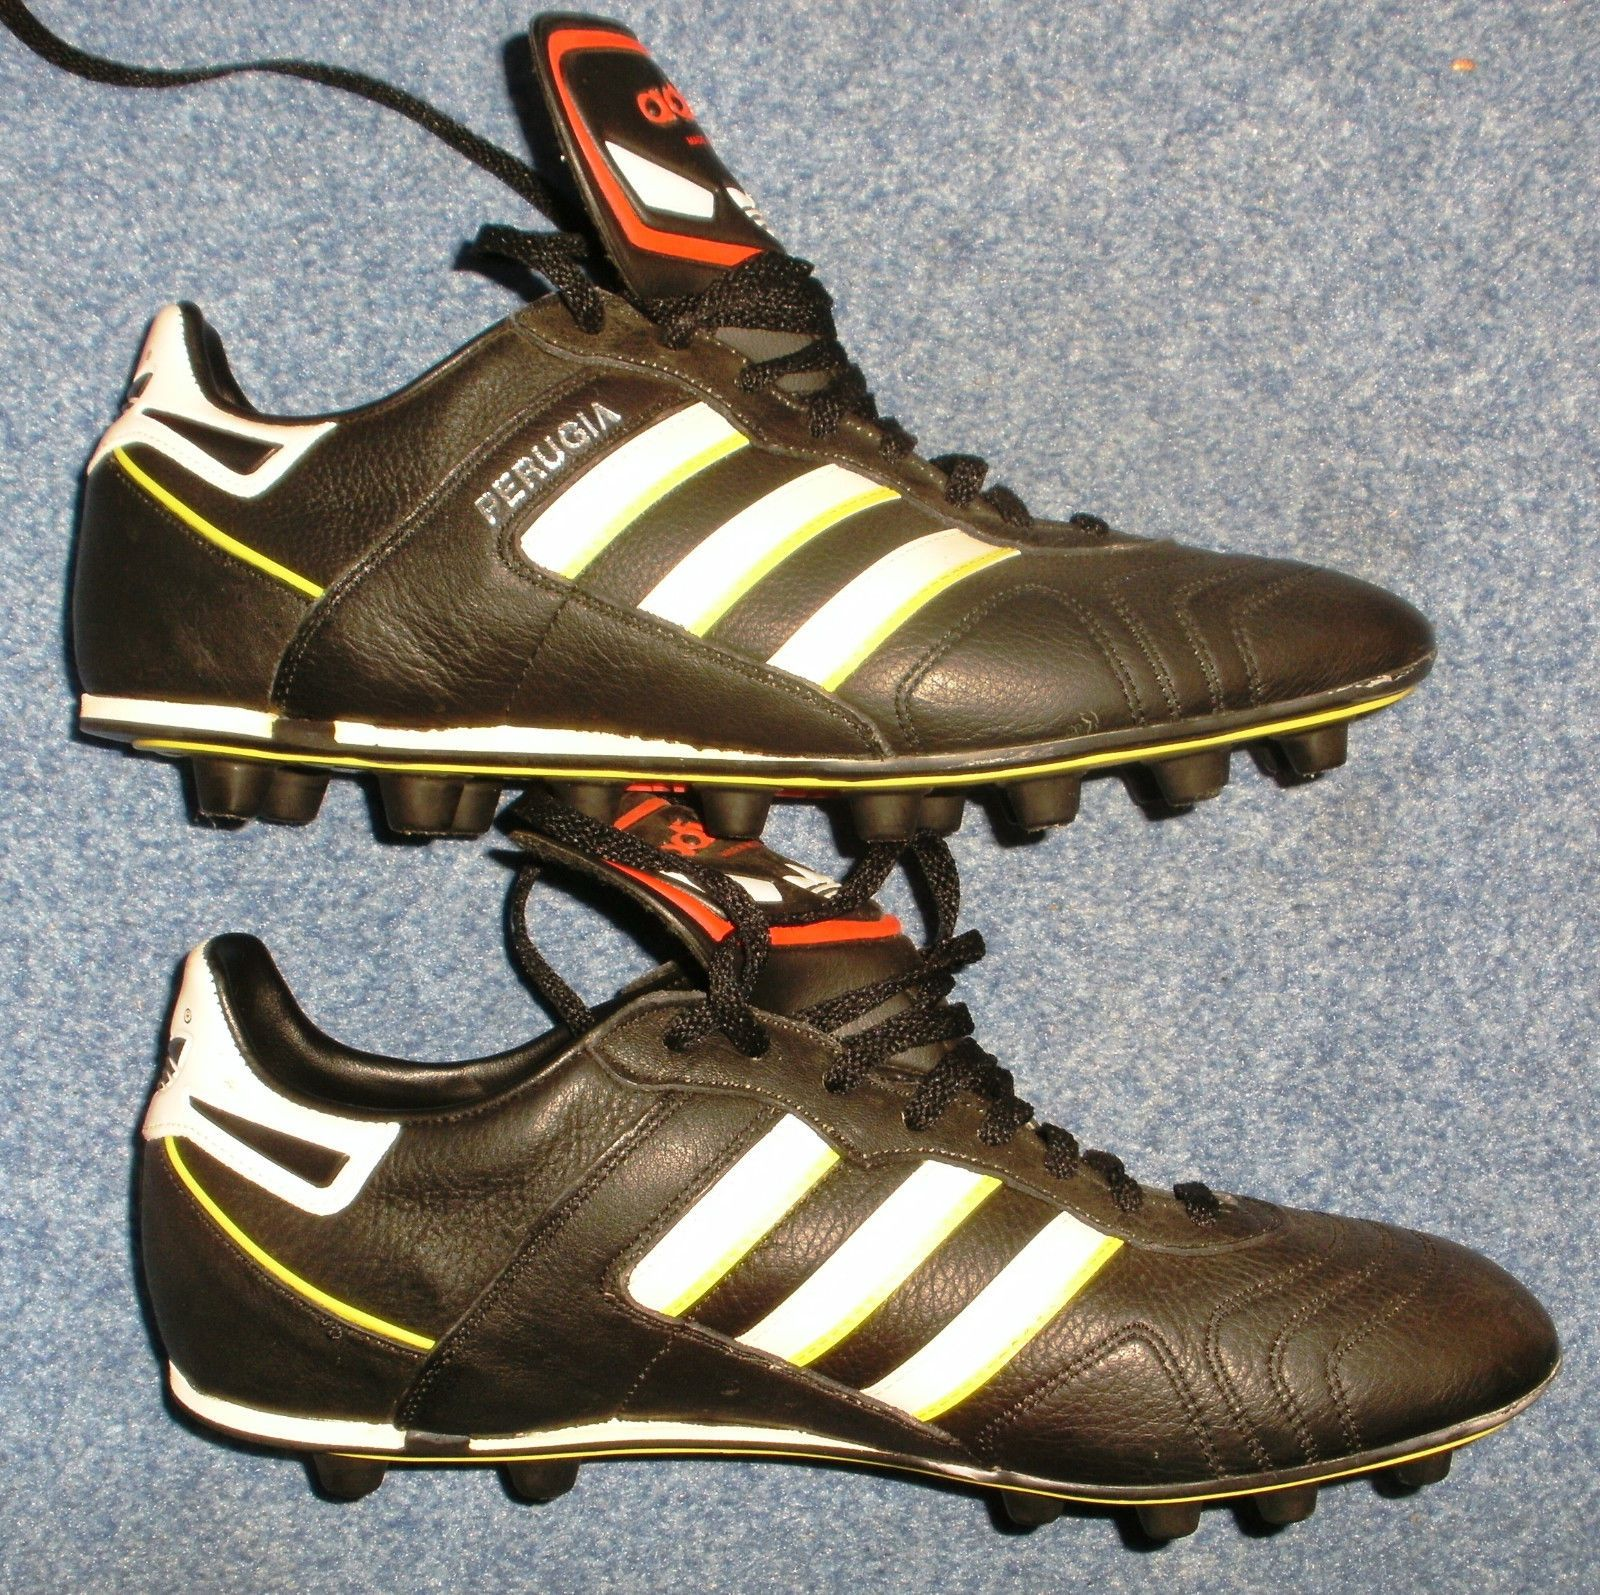 078baa57b1d0 Vintage Sammlerschuhe Adidas Fußballschuhe Perugia FG WM 1990 NEU, Gr. 8,5  = 42 | eBay